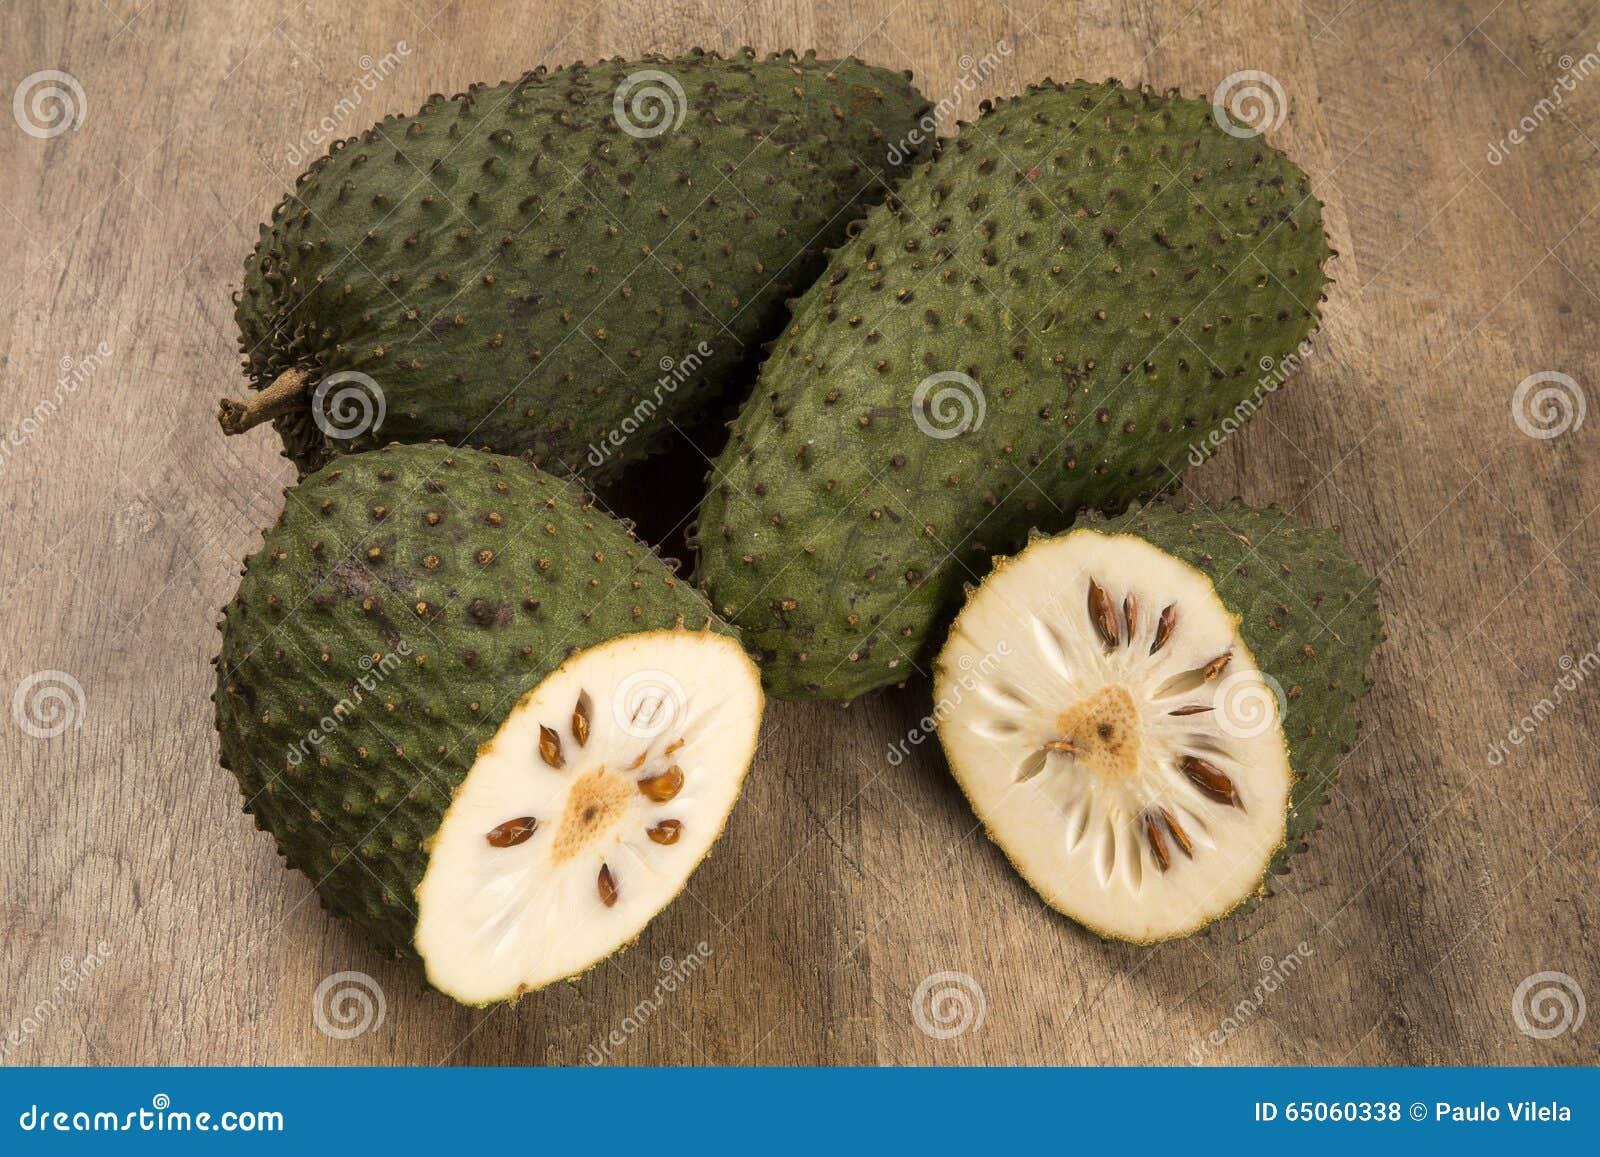 Sour Sop, Prickly Custard Apple  Stock Photo - Image of thorny